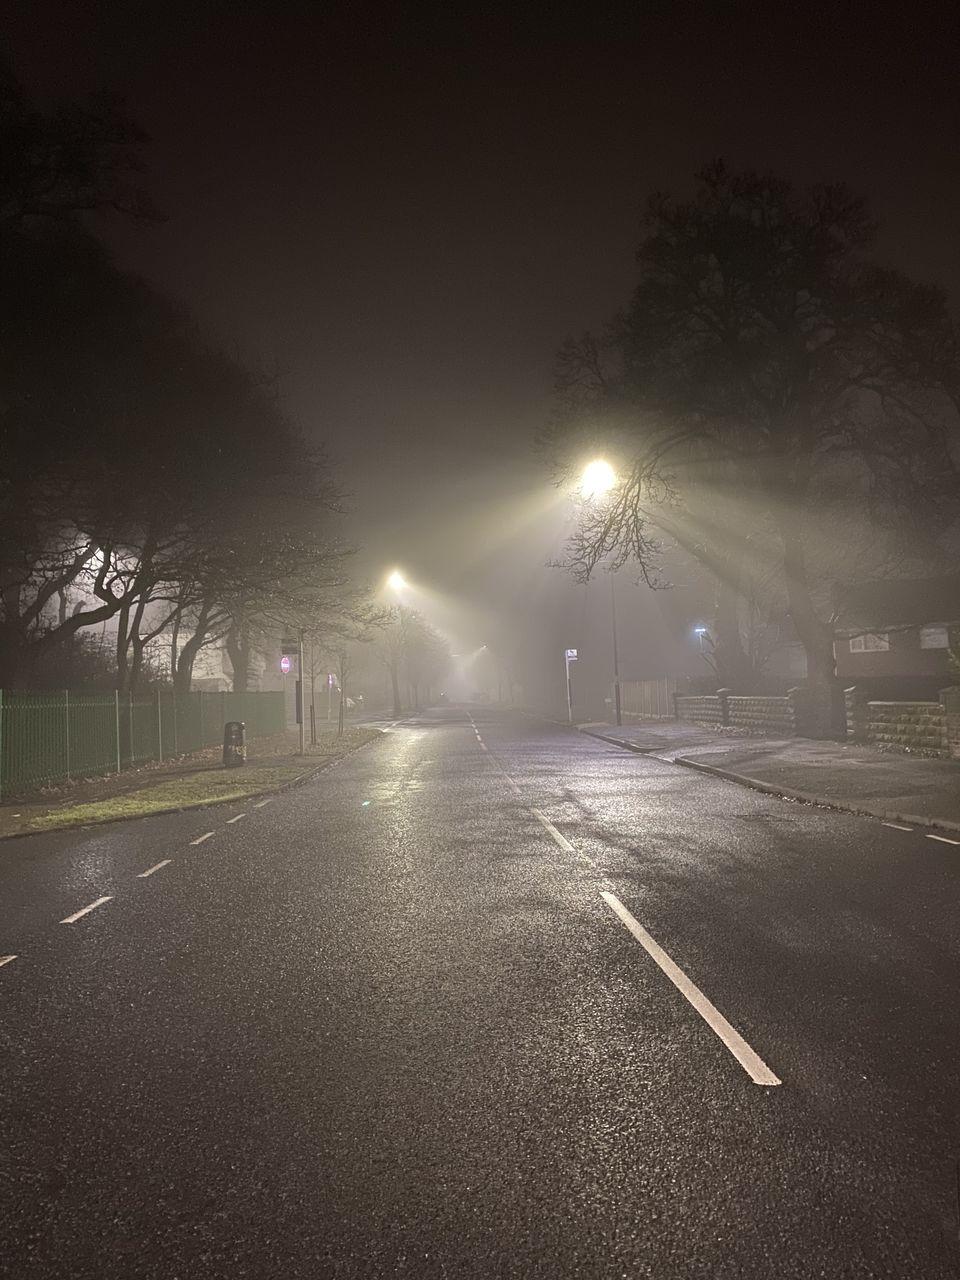 EMPTY ROAD BY ILLUMINATED STREET LIGHT AT NIGHT